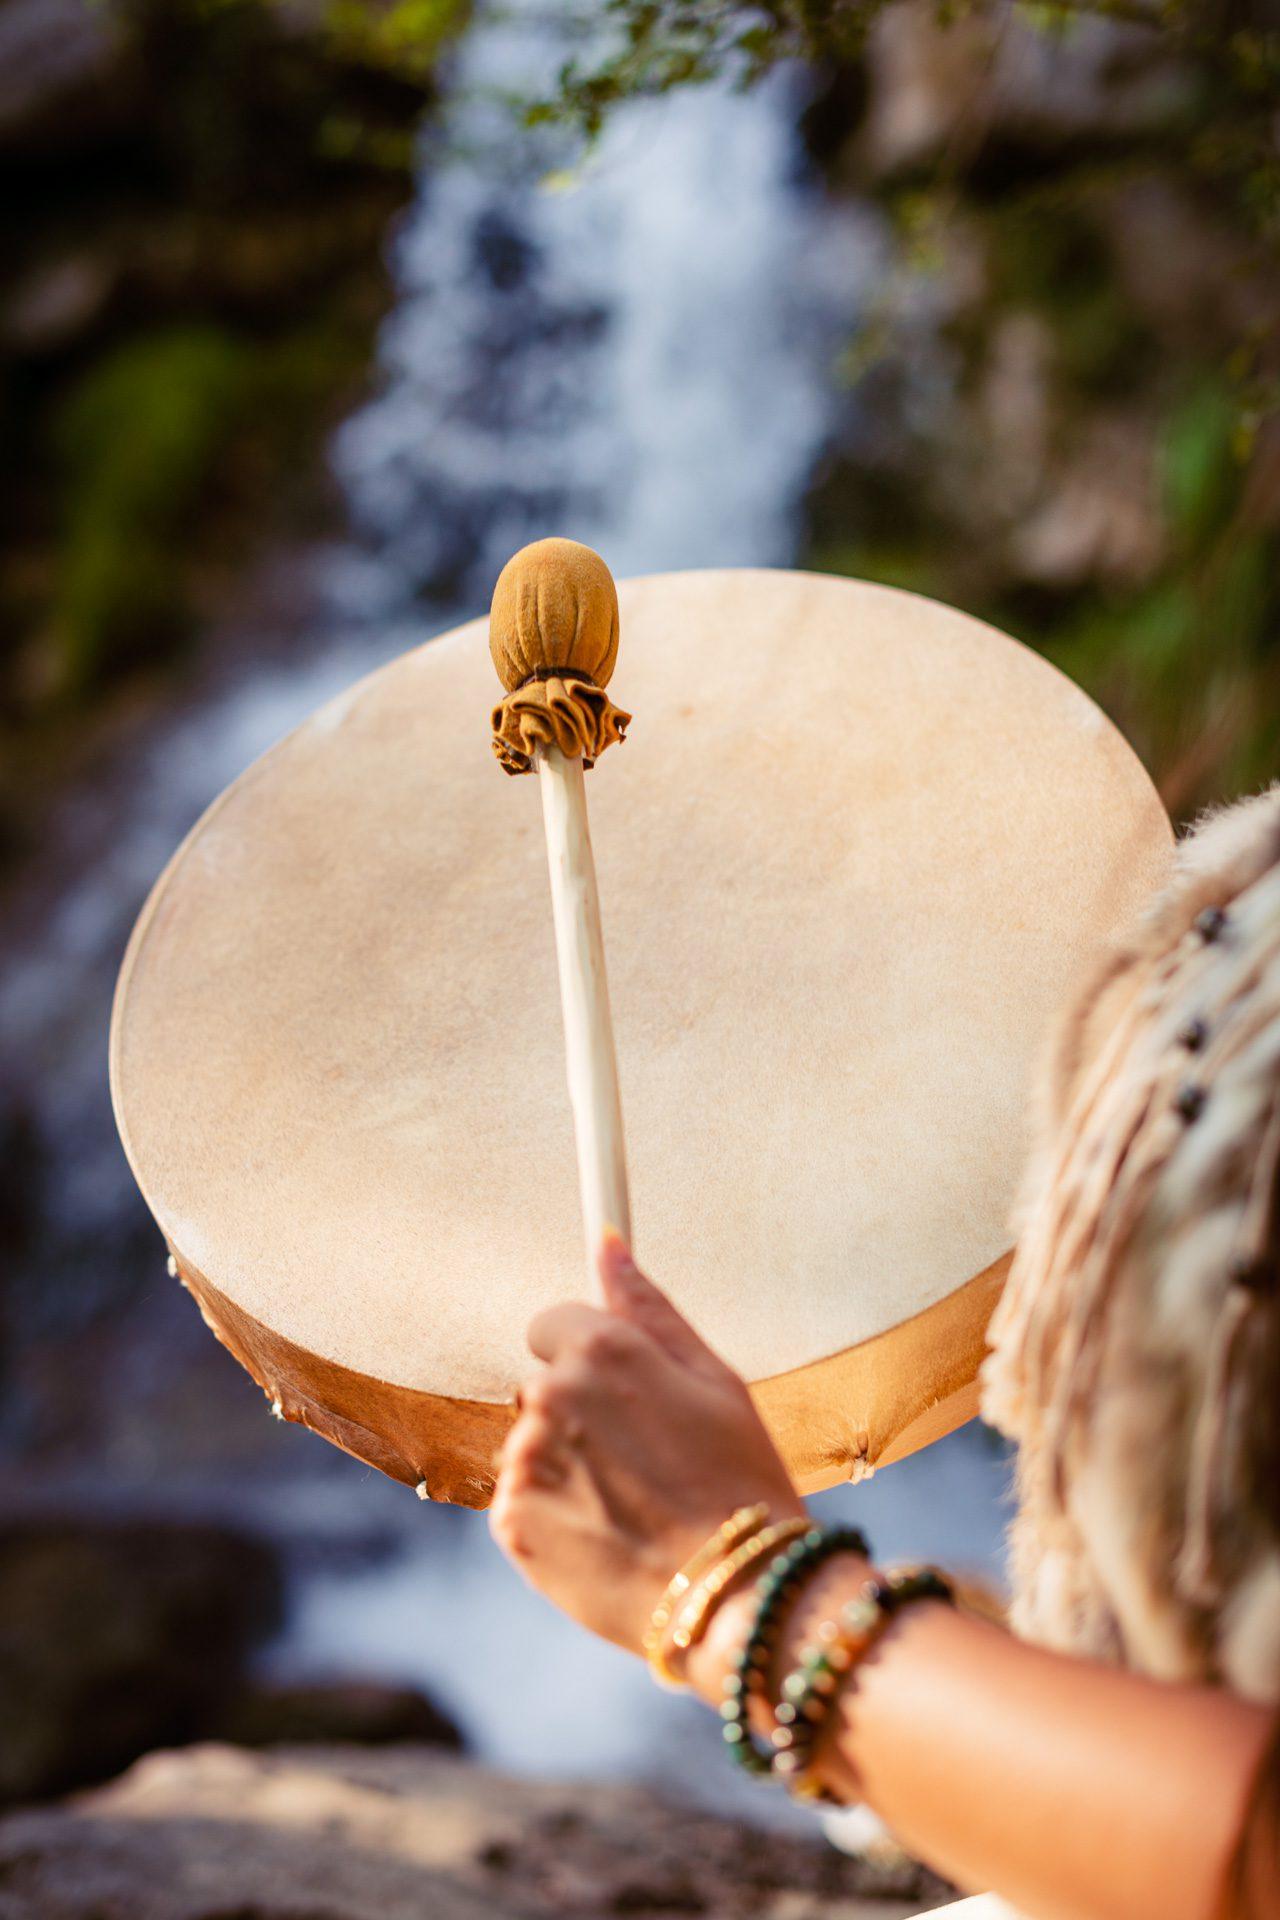 tambour-chamanique-symboliques-des-animaux